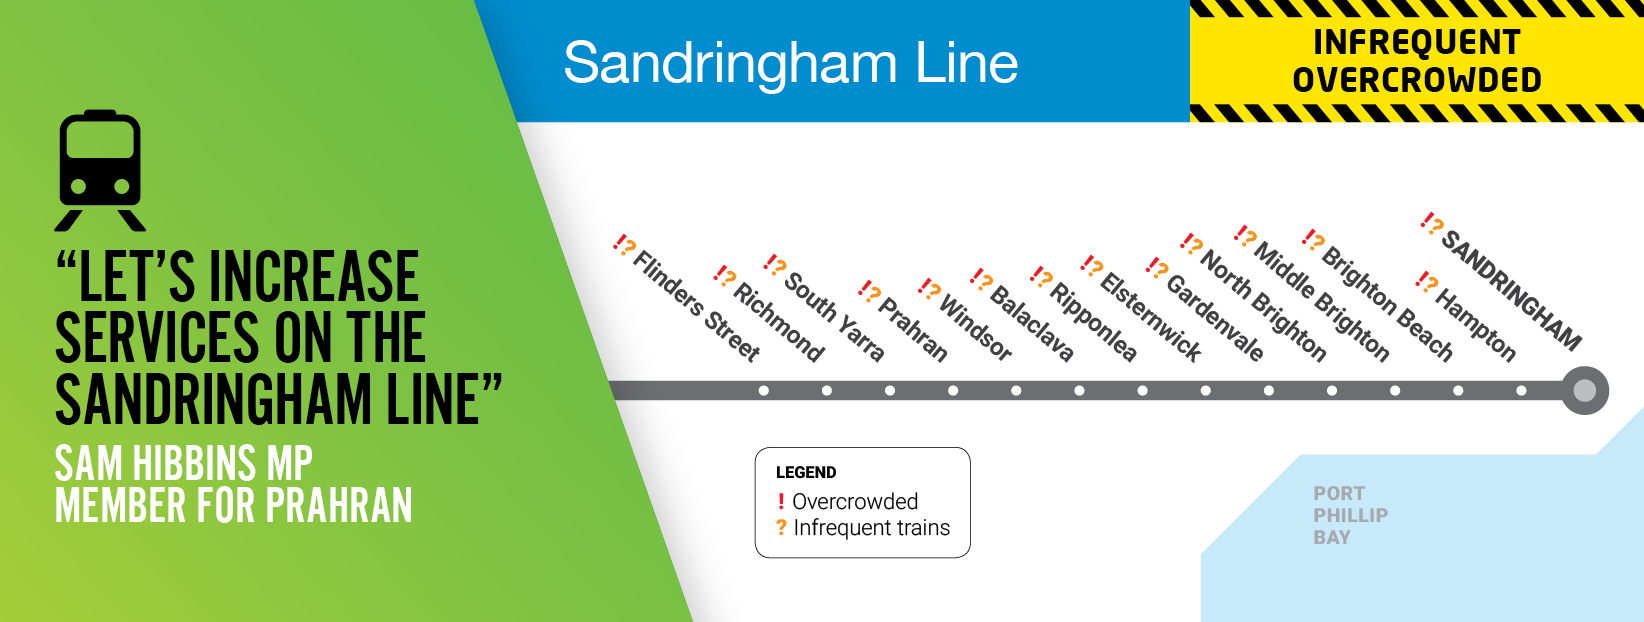 sandringham_web_banner.png